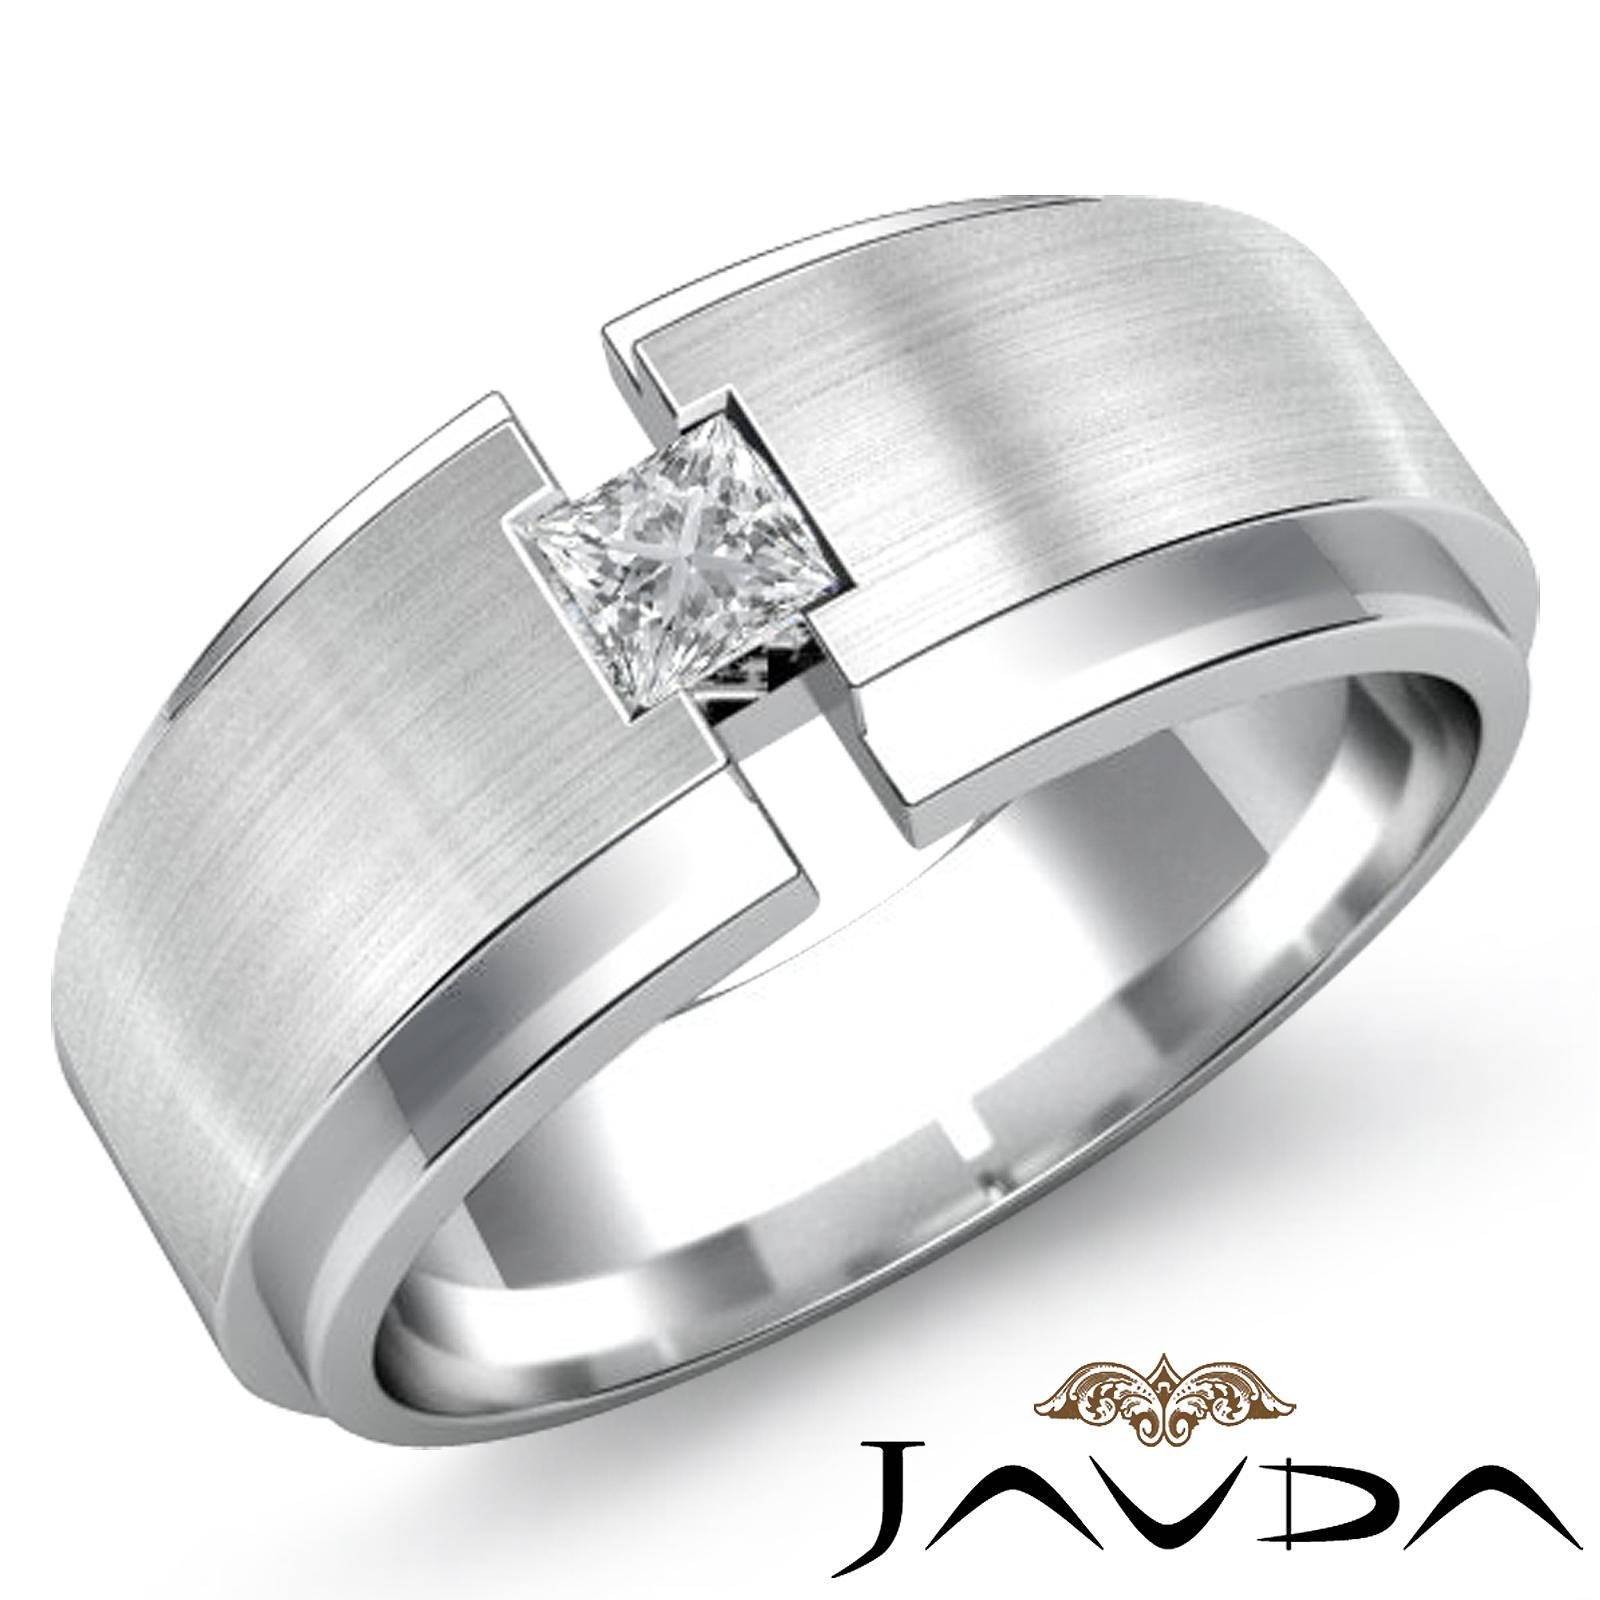 Solitaire Princess Diamond Mens Wedding Band Matt Brushed Ring 14k